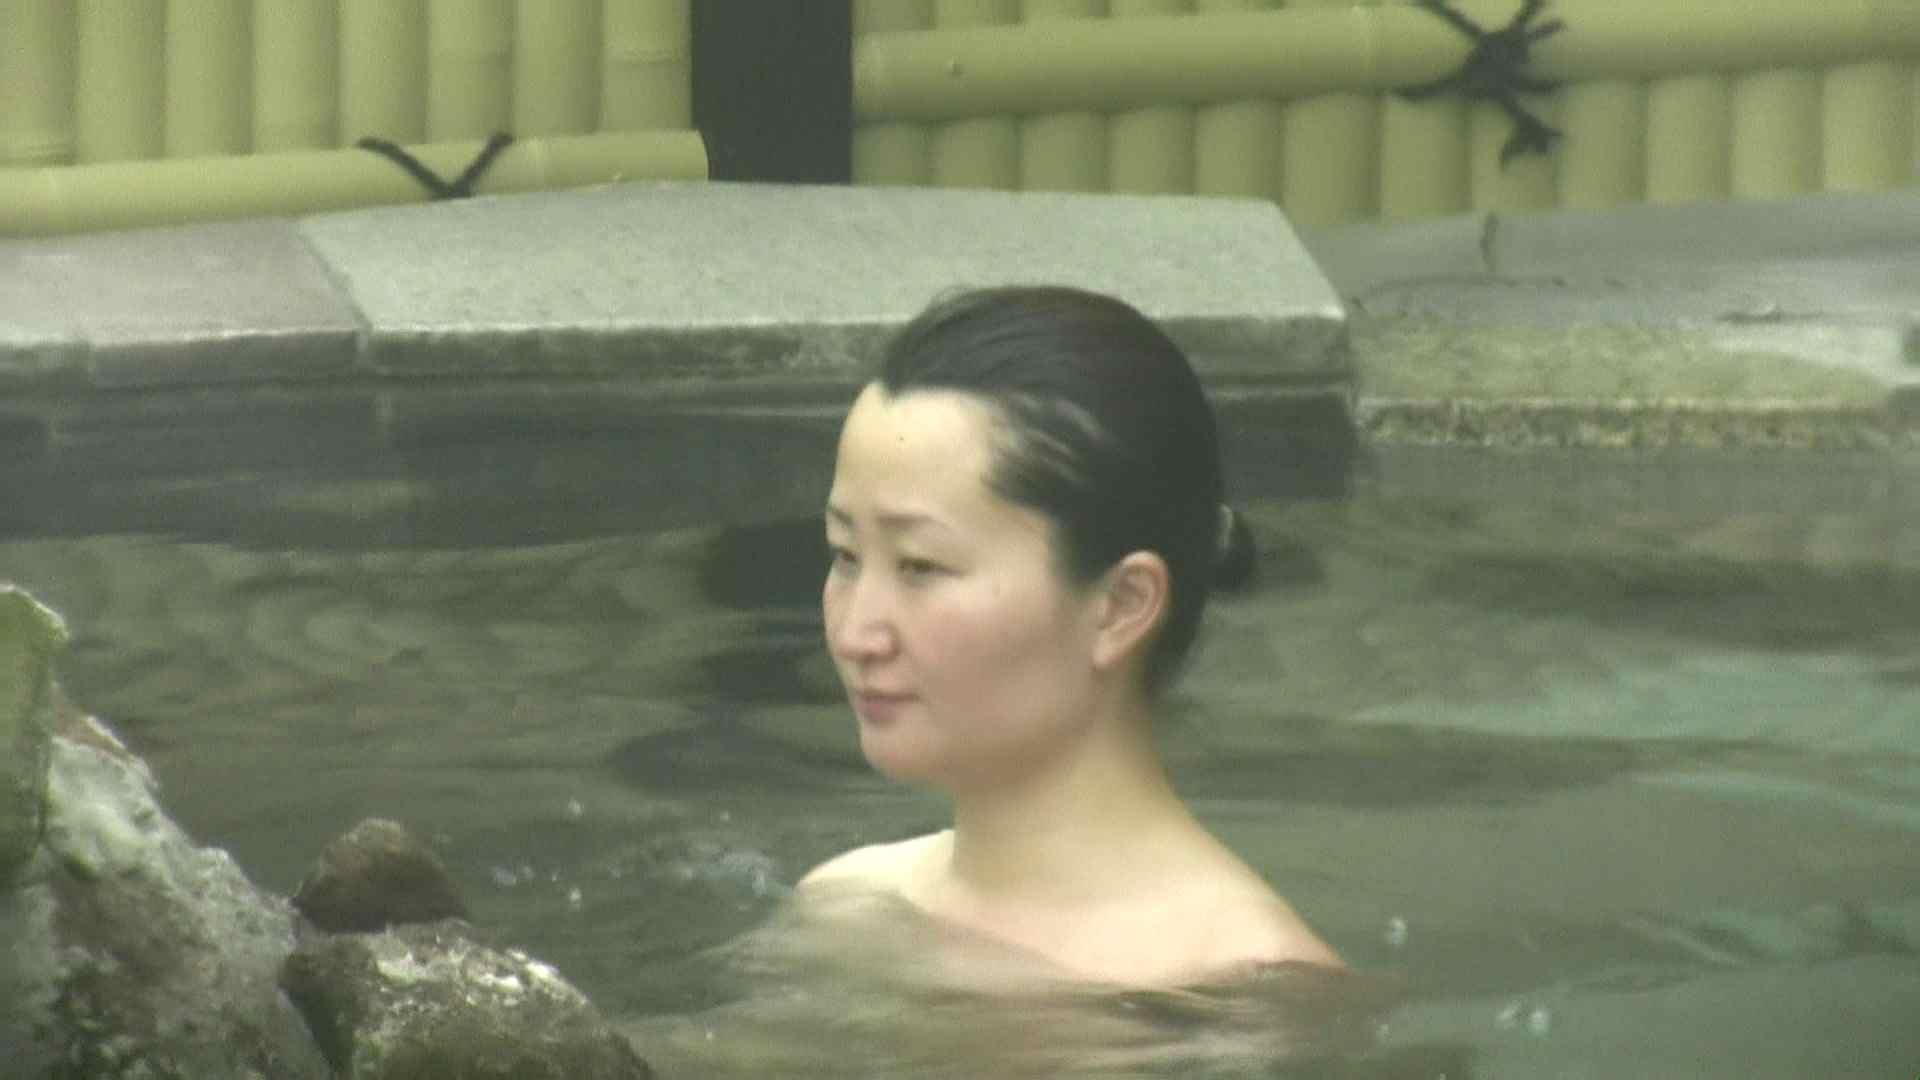 Aquaな露天風呂Vol.632 盗撮 | OLセックス  70画像 19